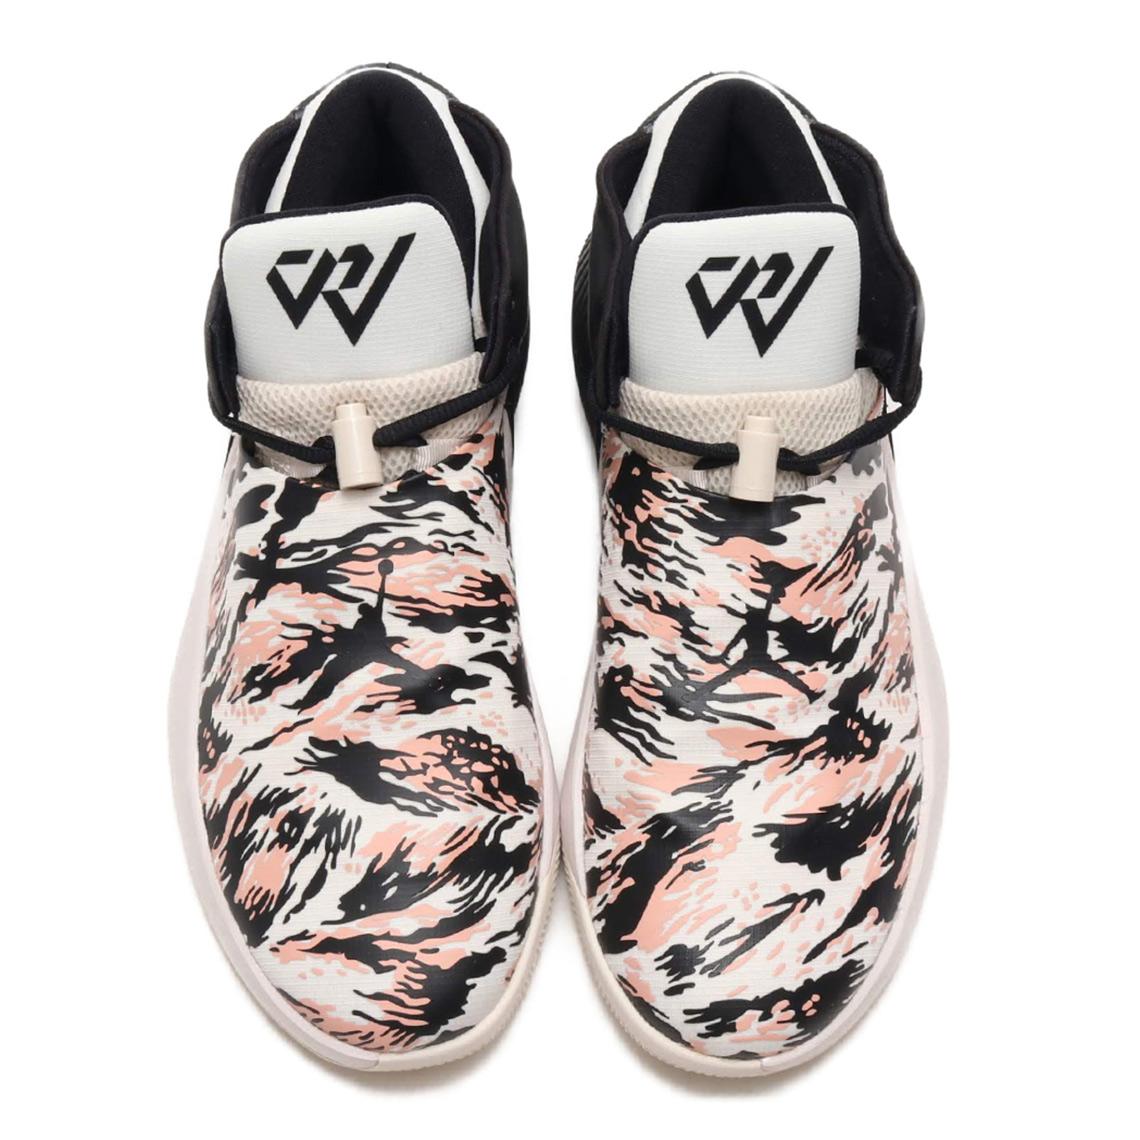 3667ac3bb19 Jordan Why Not Zer0.1 Low Camo AR0043-003 | SneakerNews.com